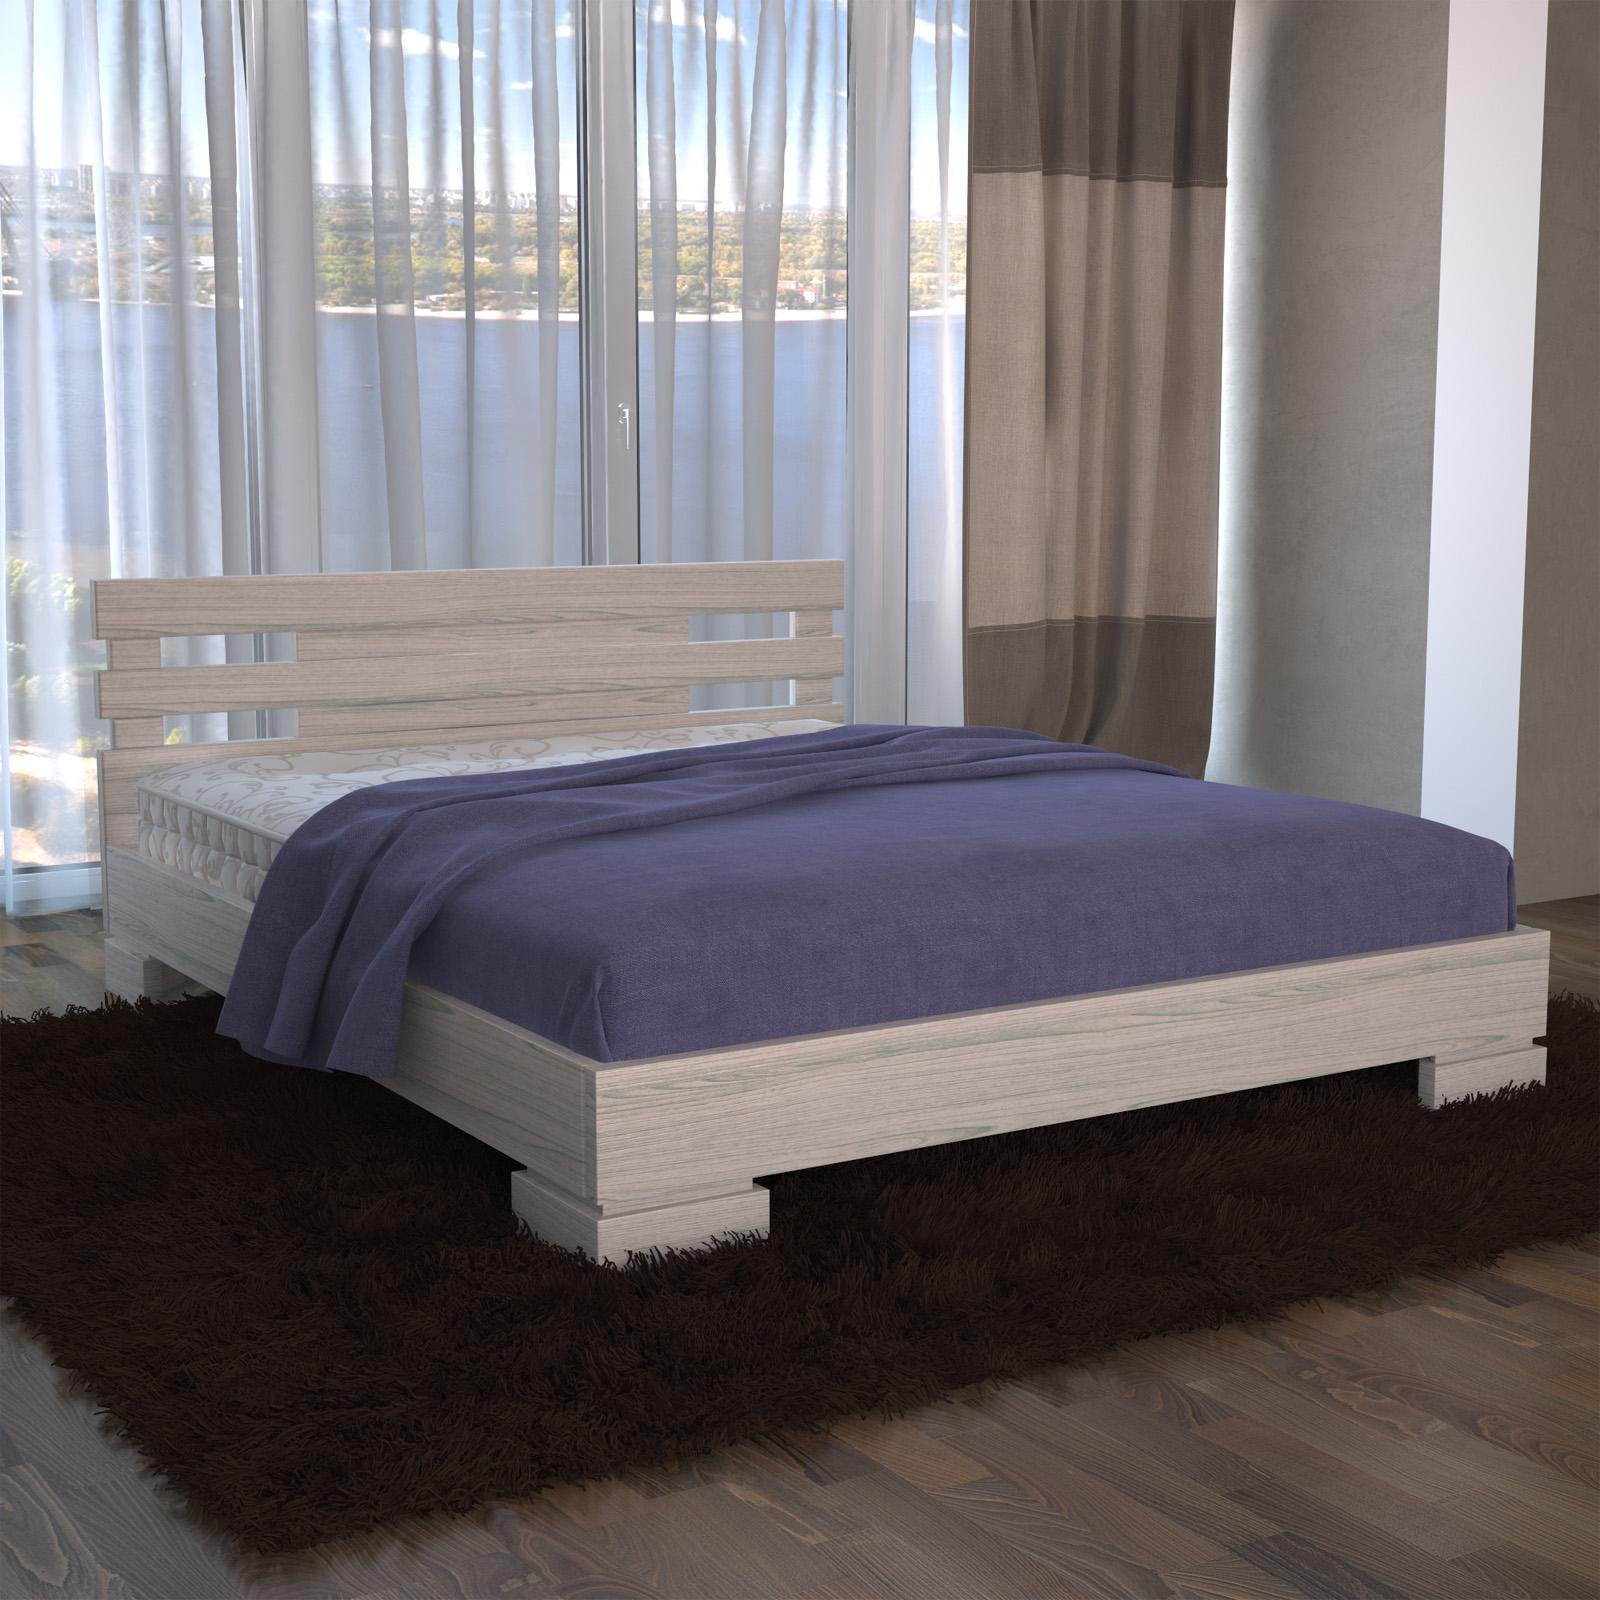 Кровать DreamLine Варна 1 (Ясень) Кровать Варна 1 (Ясень) фото